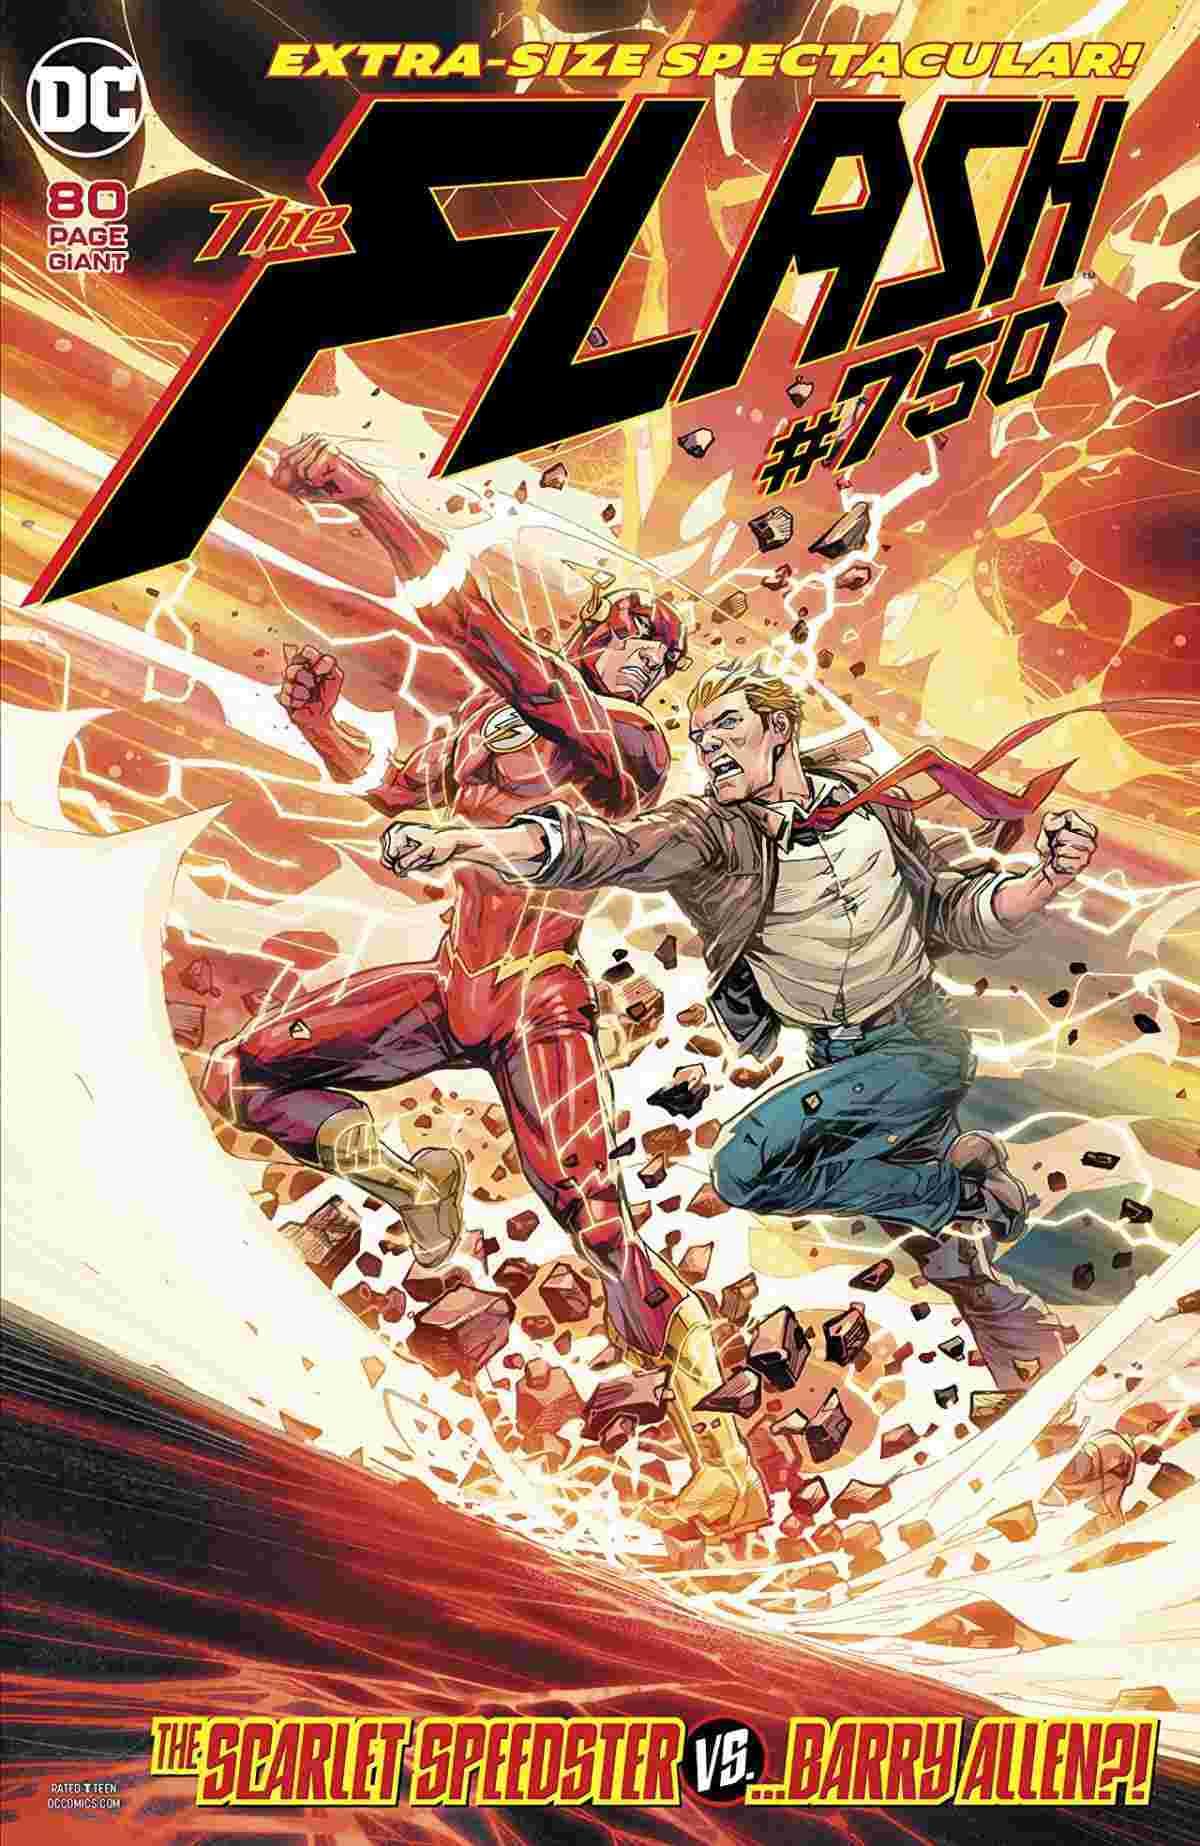 The Flash #750